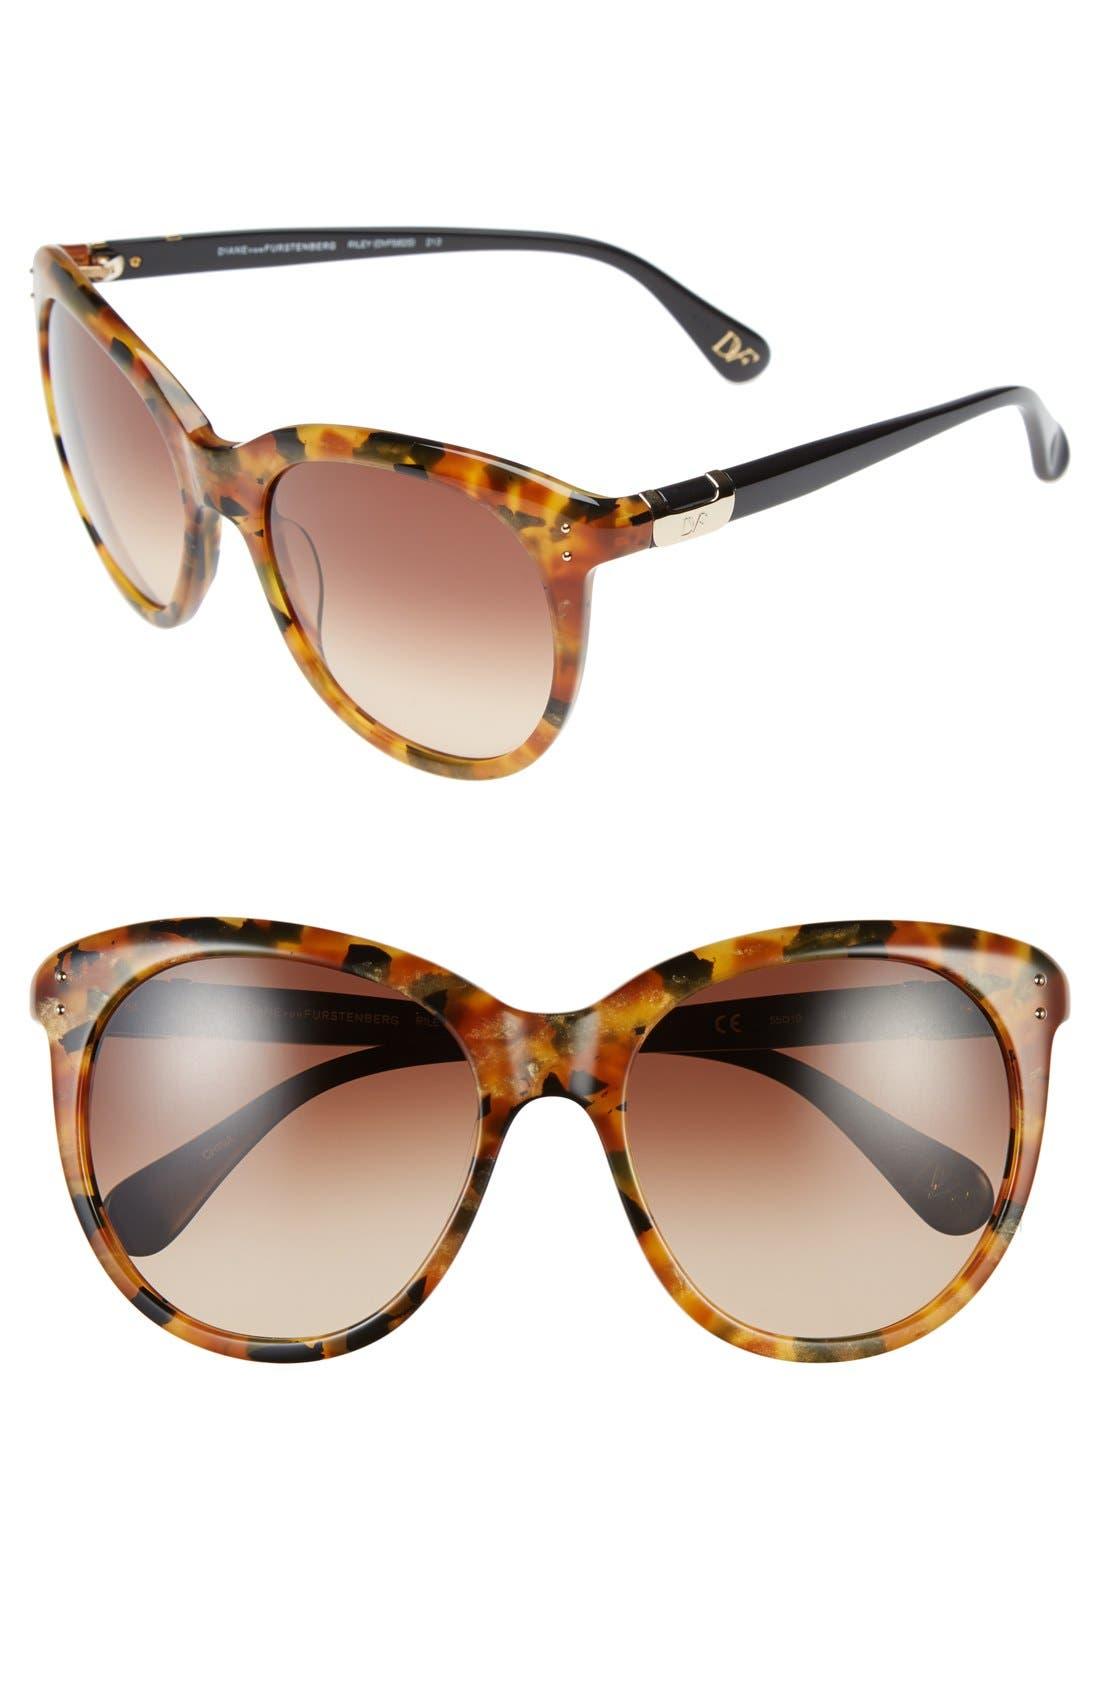 Alternate Image 1 Selected - Diane von Furstenberg 'Riley' 55mm Retro Sunglasses